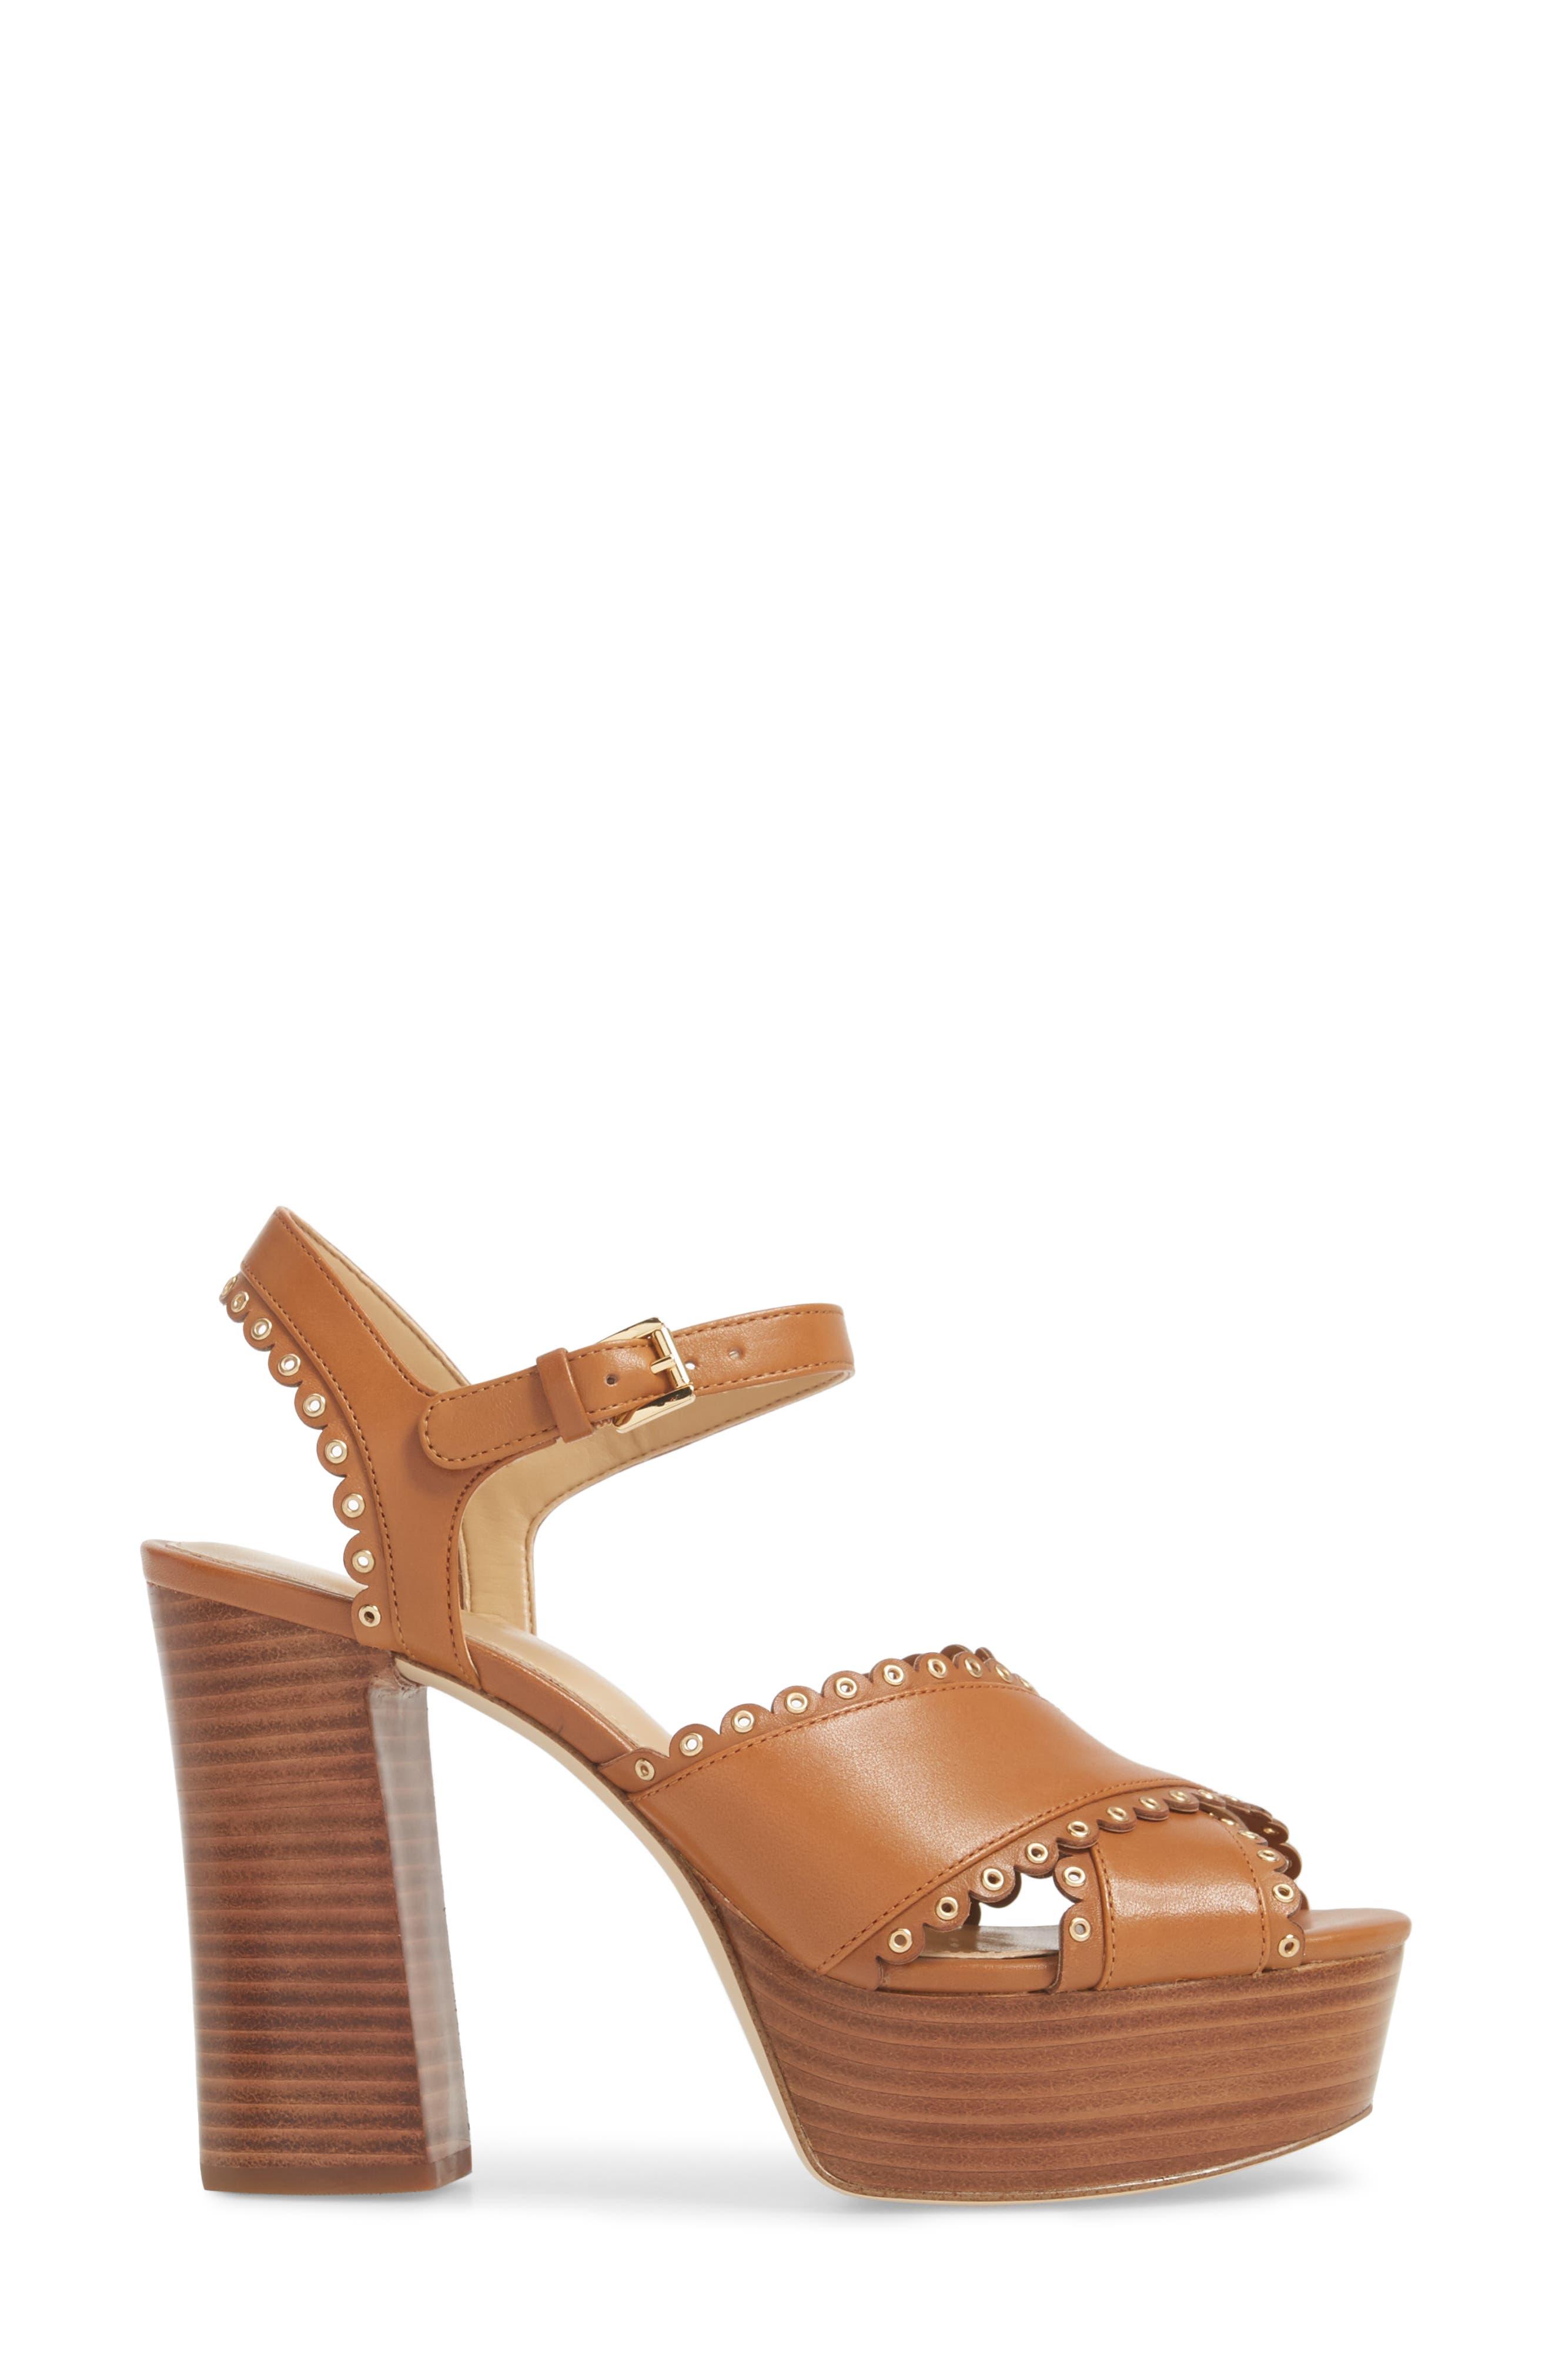 Jessie Platform Sandal,                             Alternate thumbnail 4, color,                             Acorn Leather